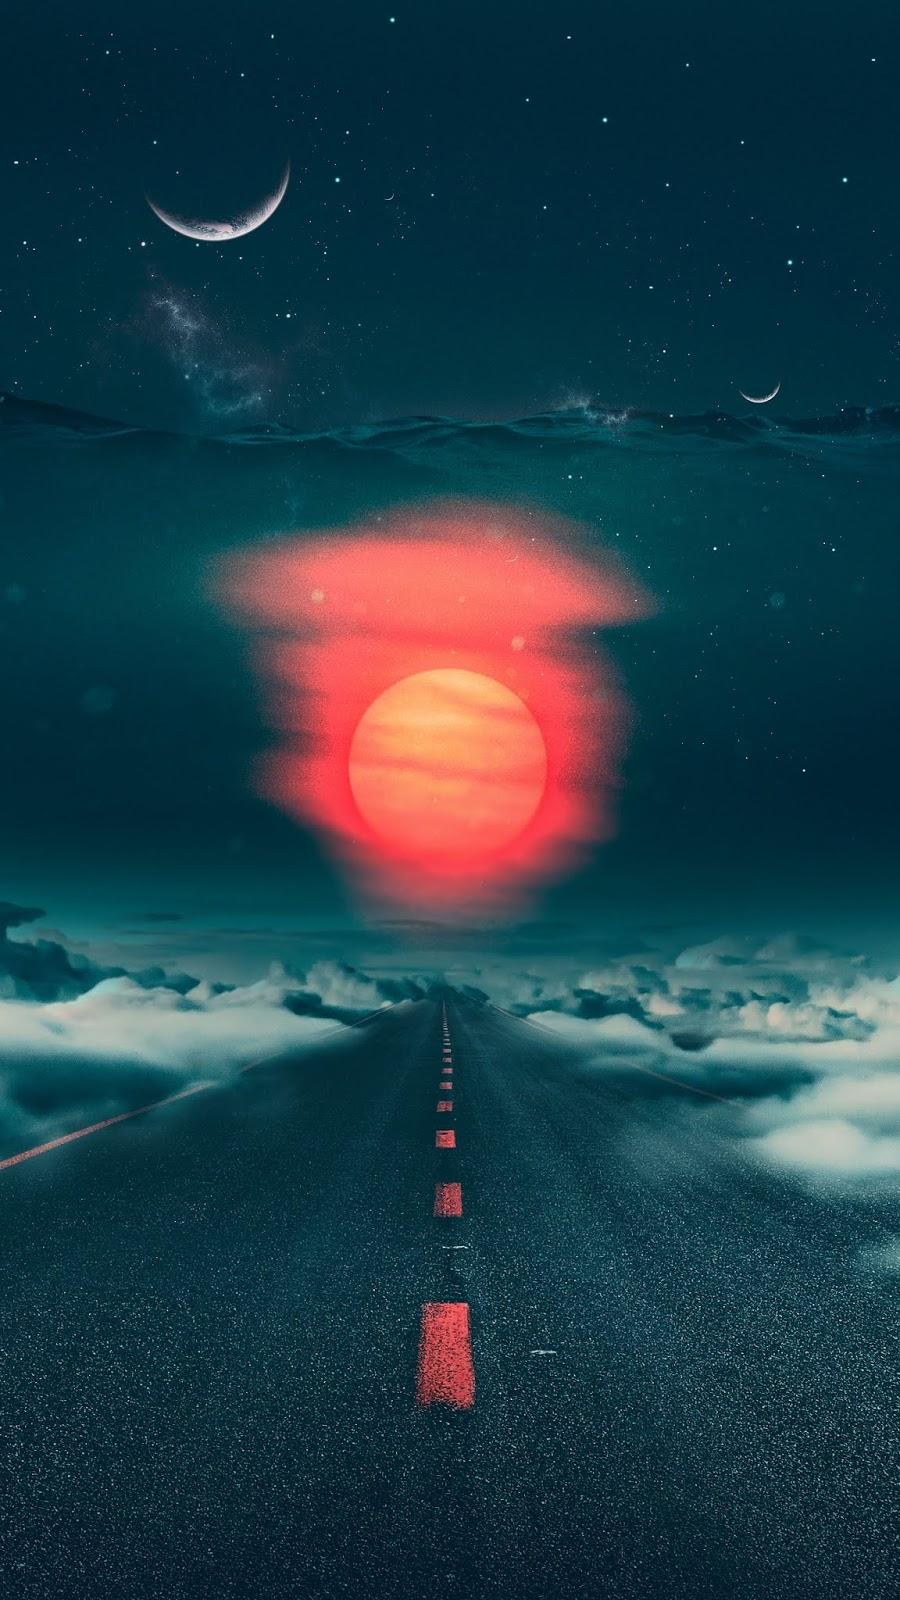 Cloudy destination